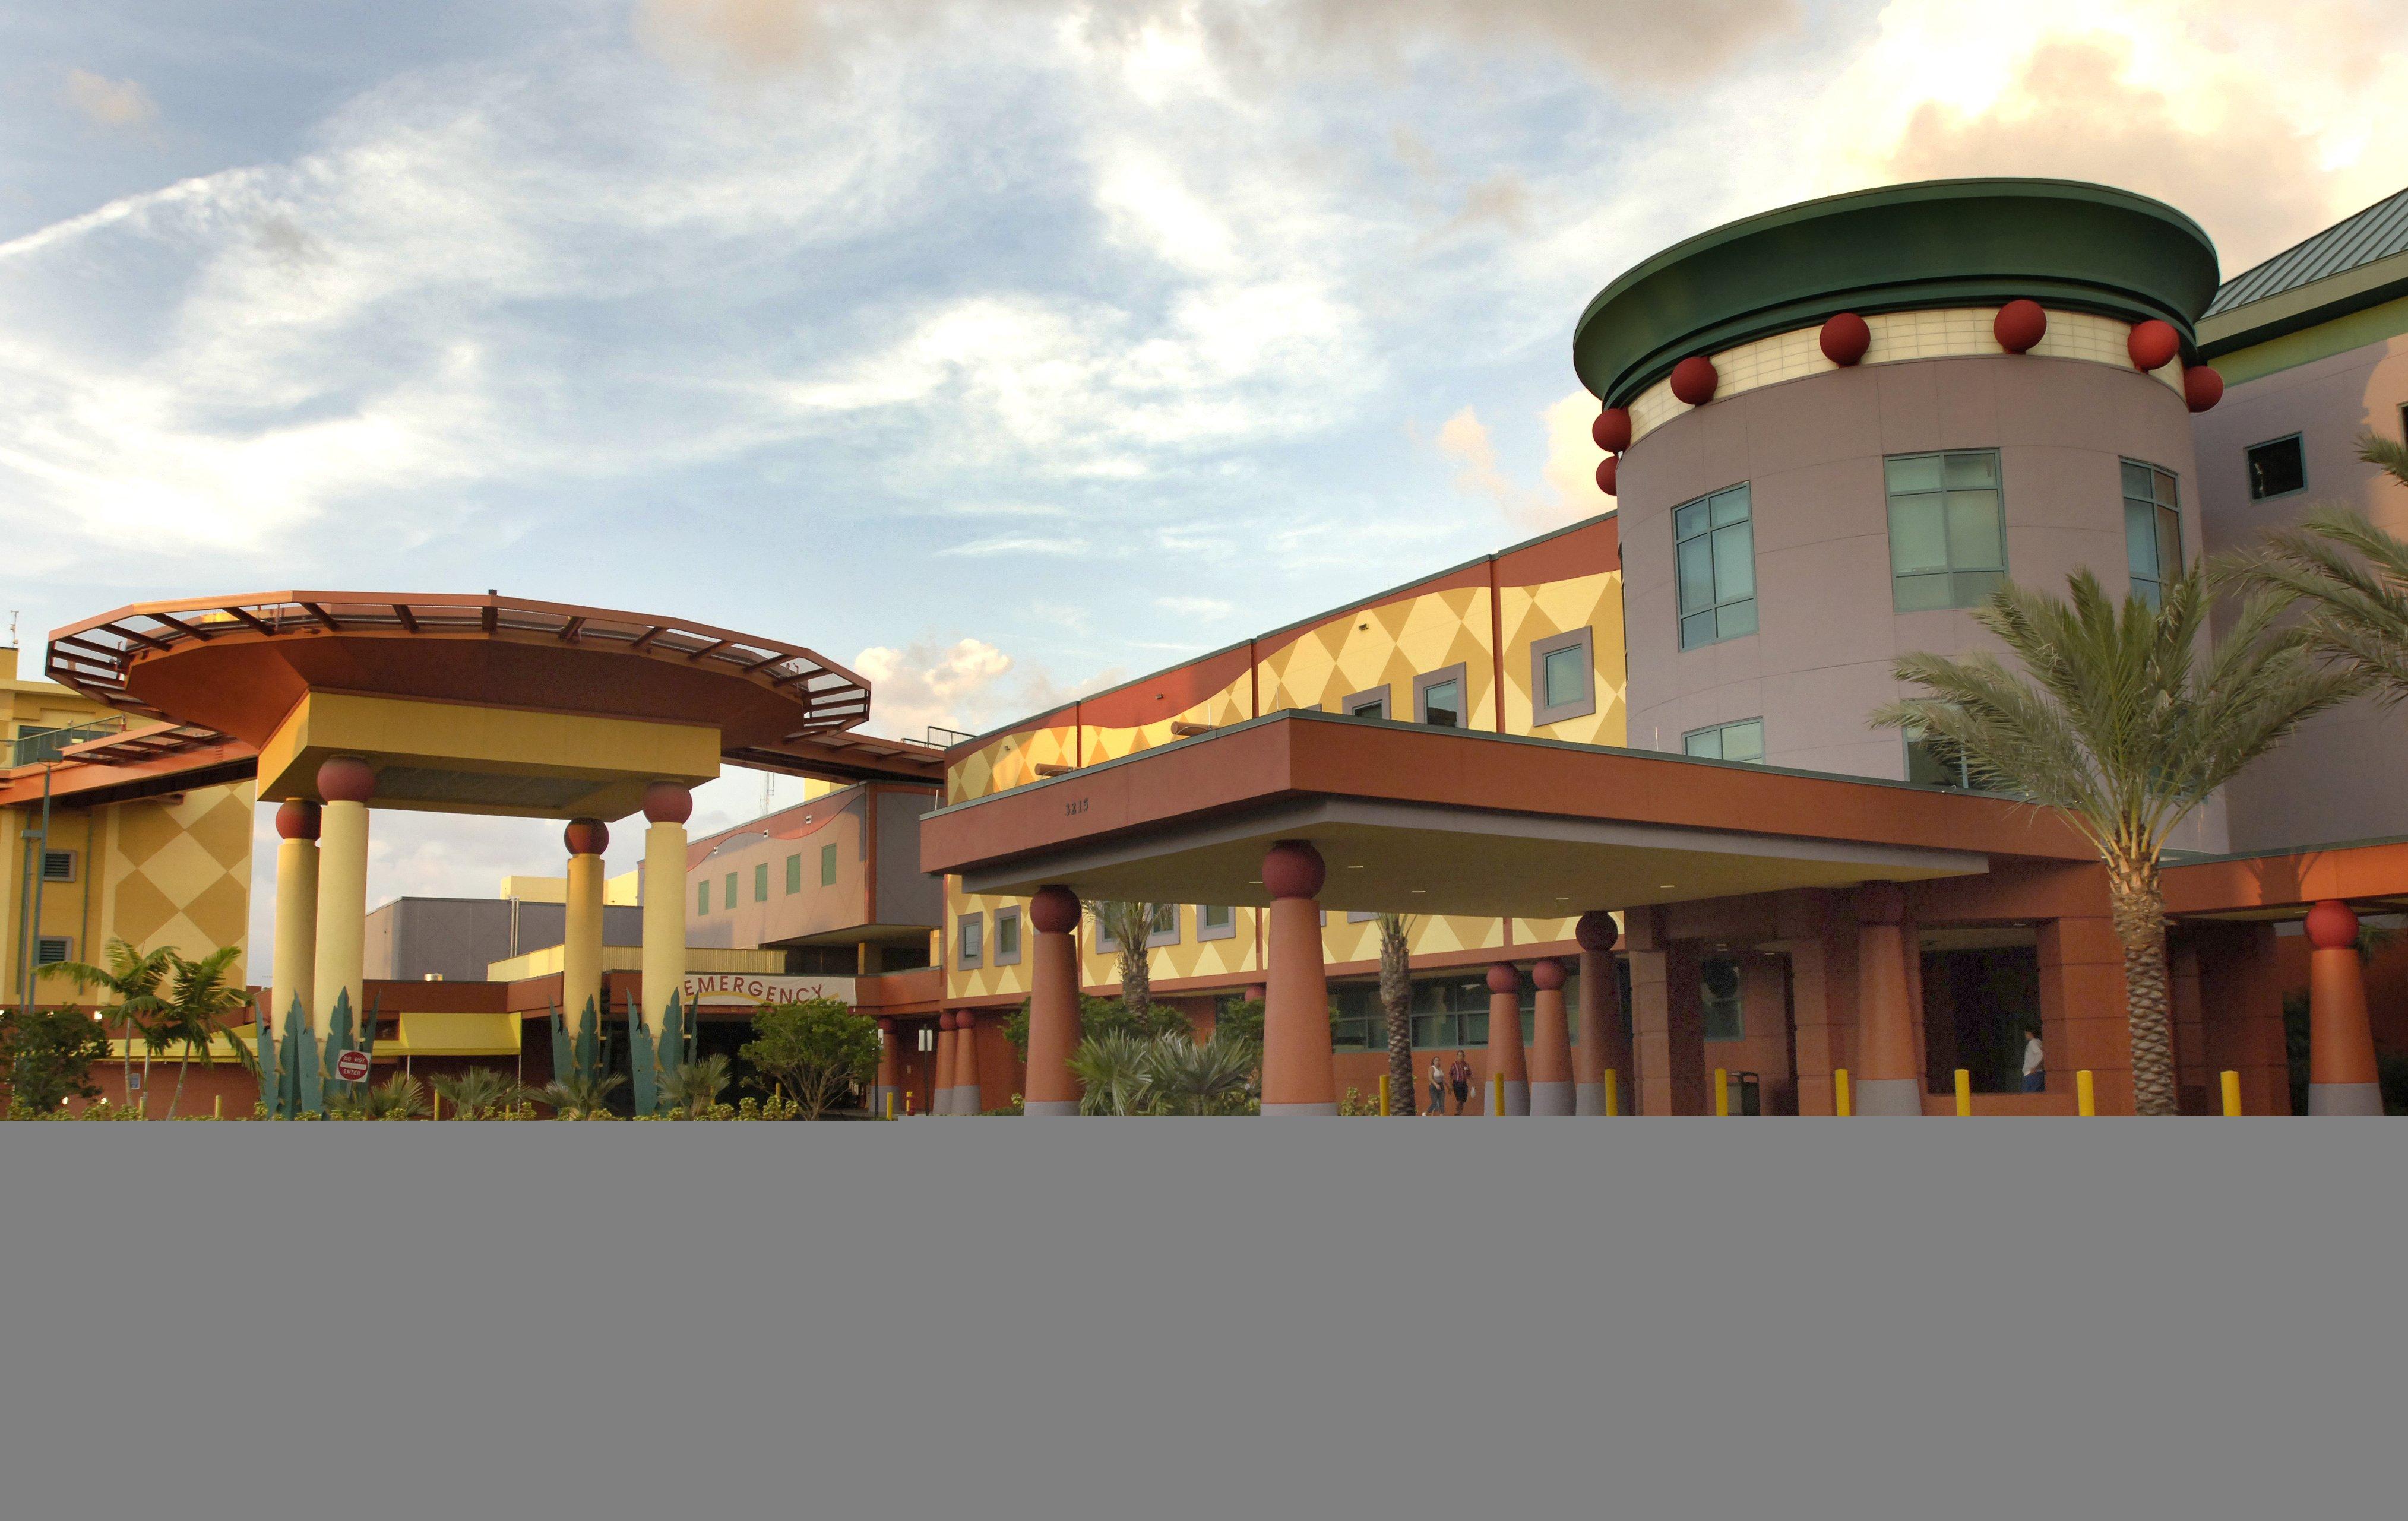 Nicklaus Children's Hospital Image